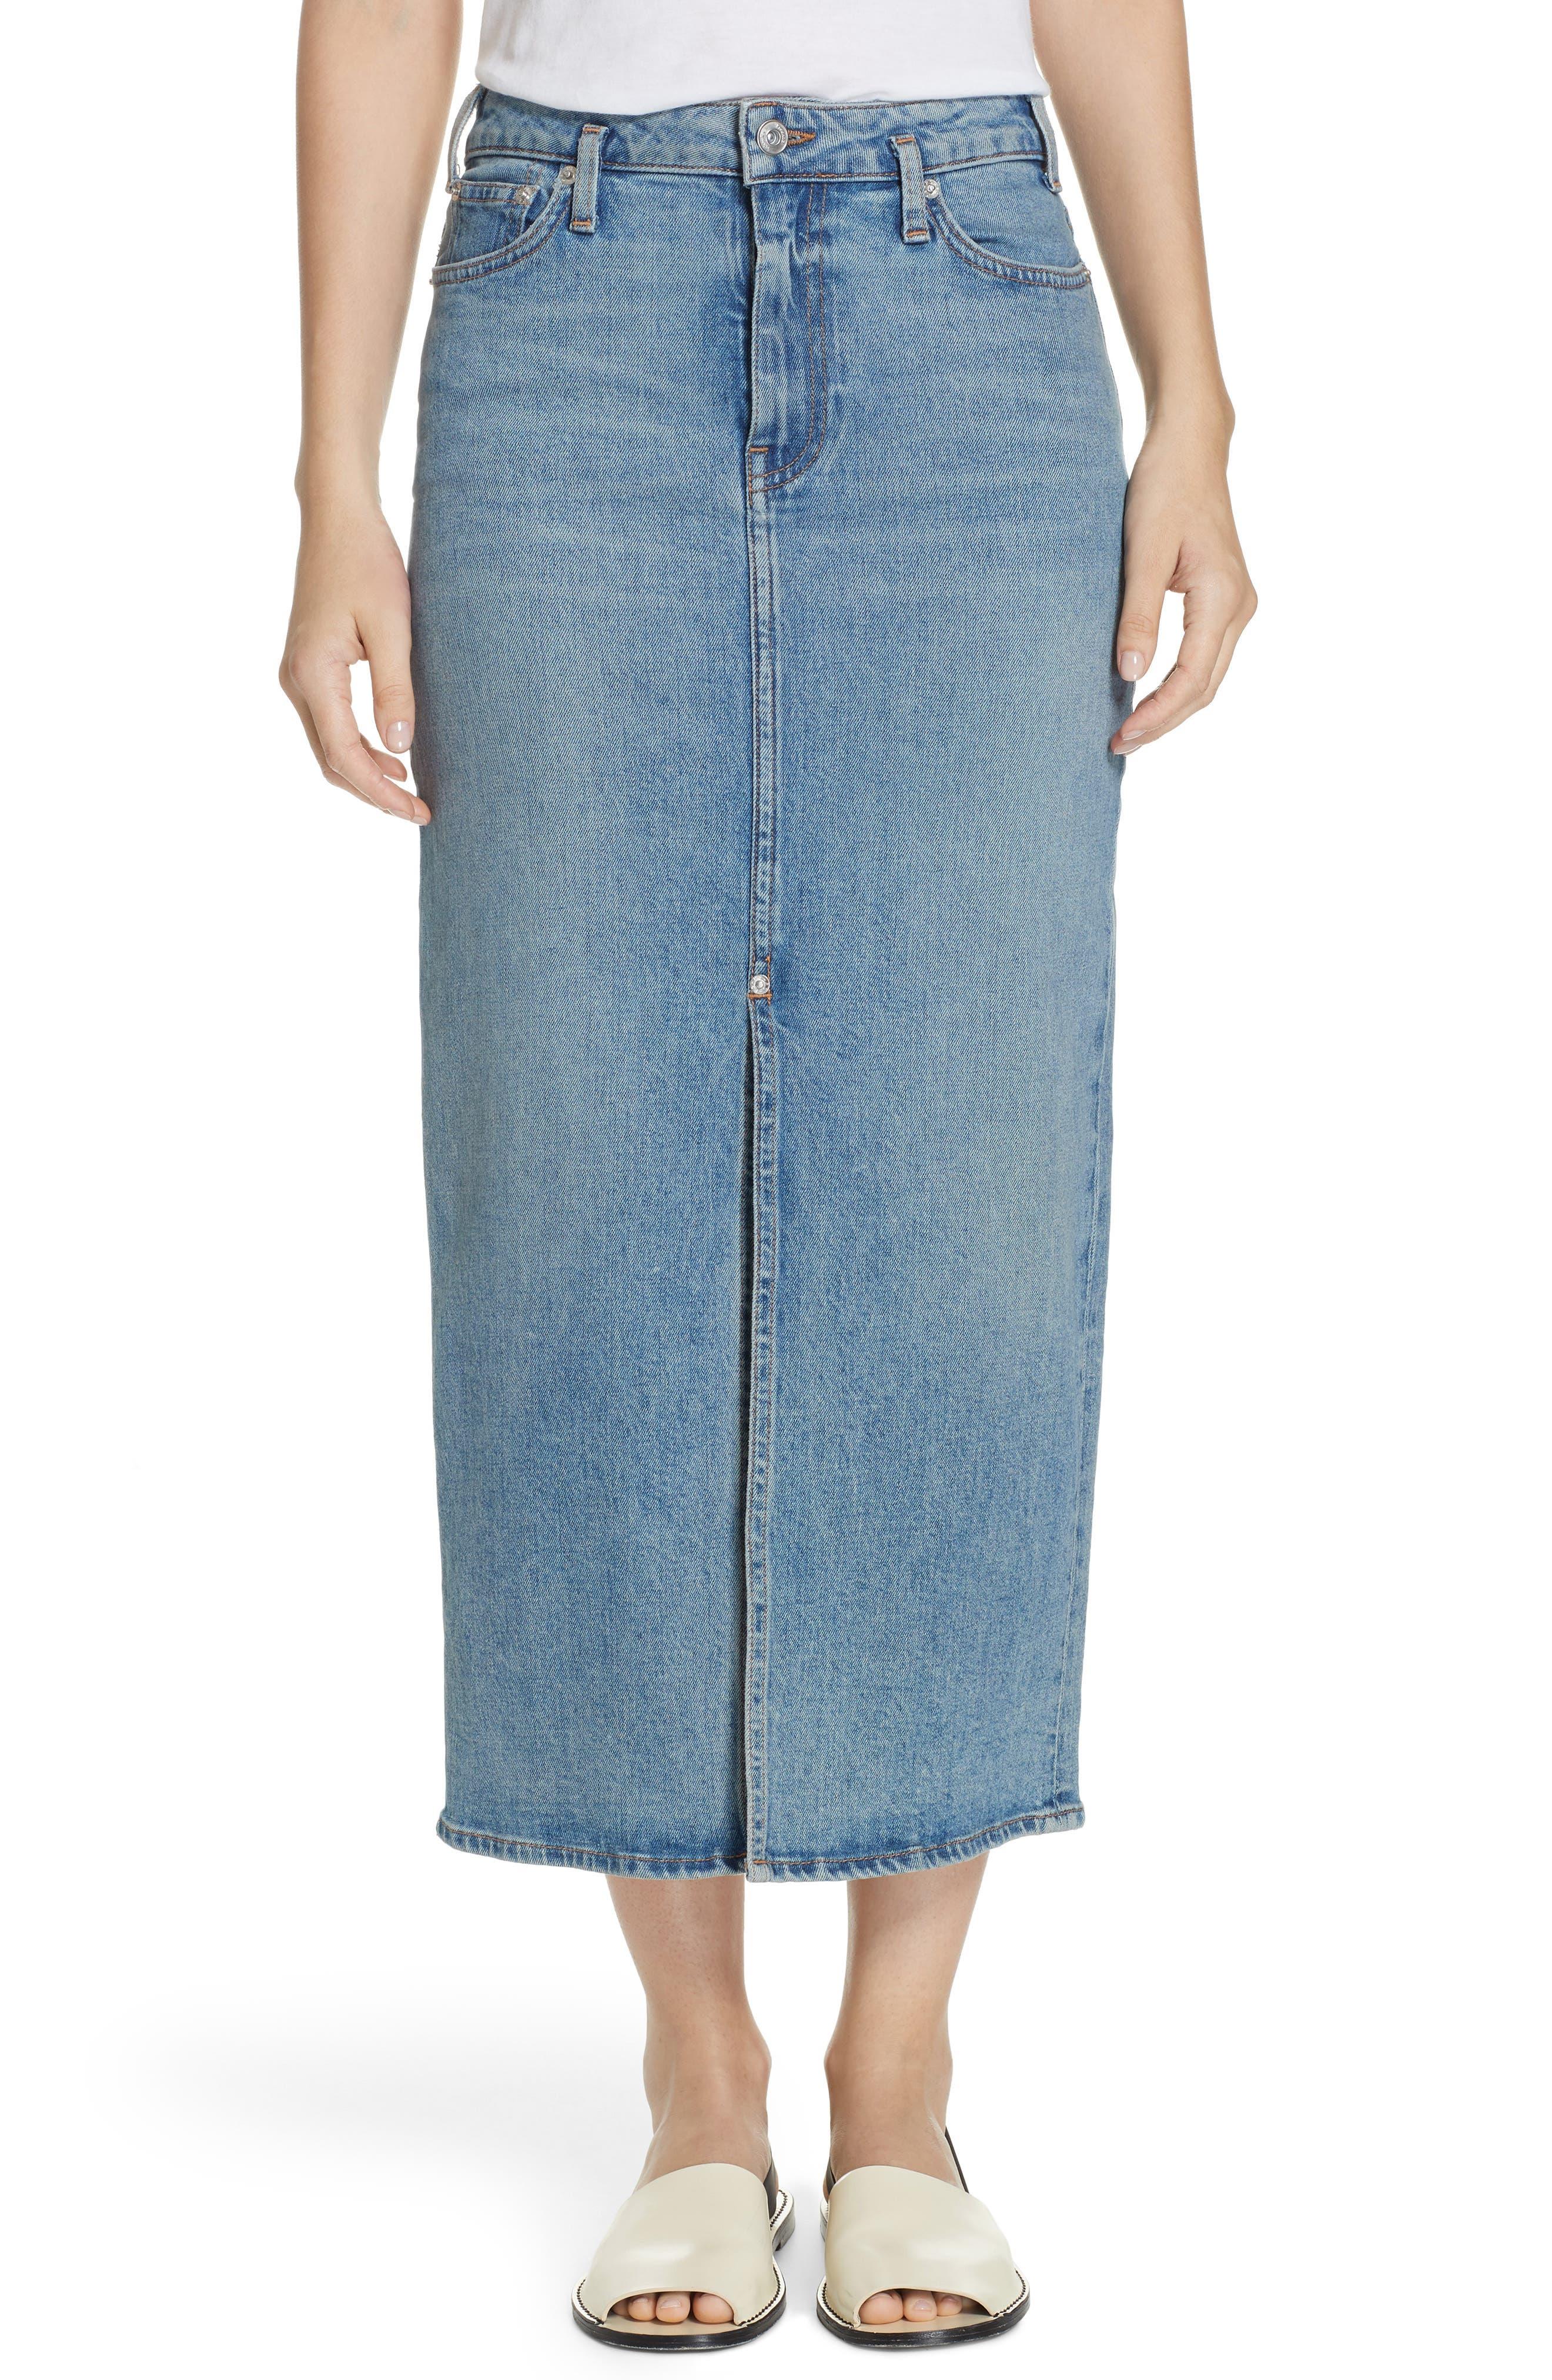 PROENZA SCHOULER, Slit Seam Denim Midi Skirt, Main thumbnail 1, color, CALIFORNIA